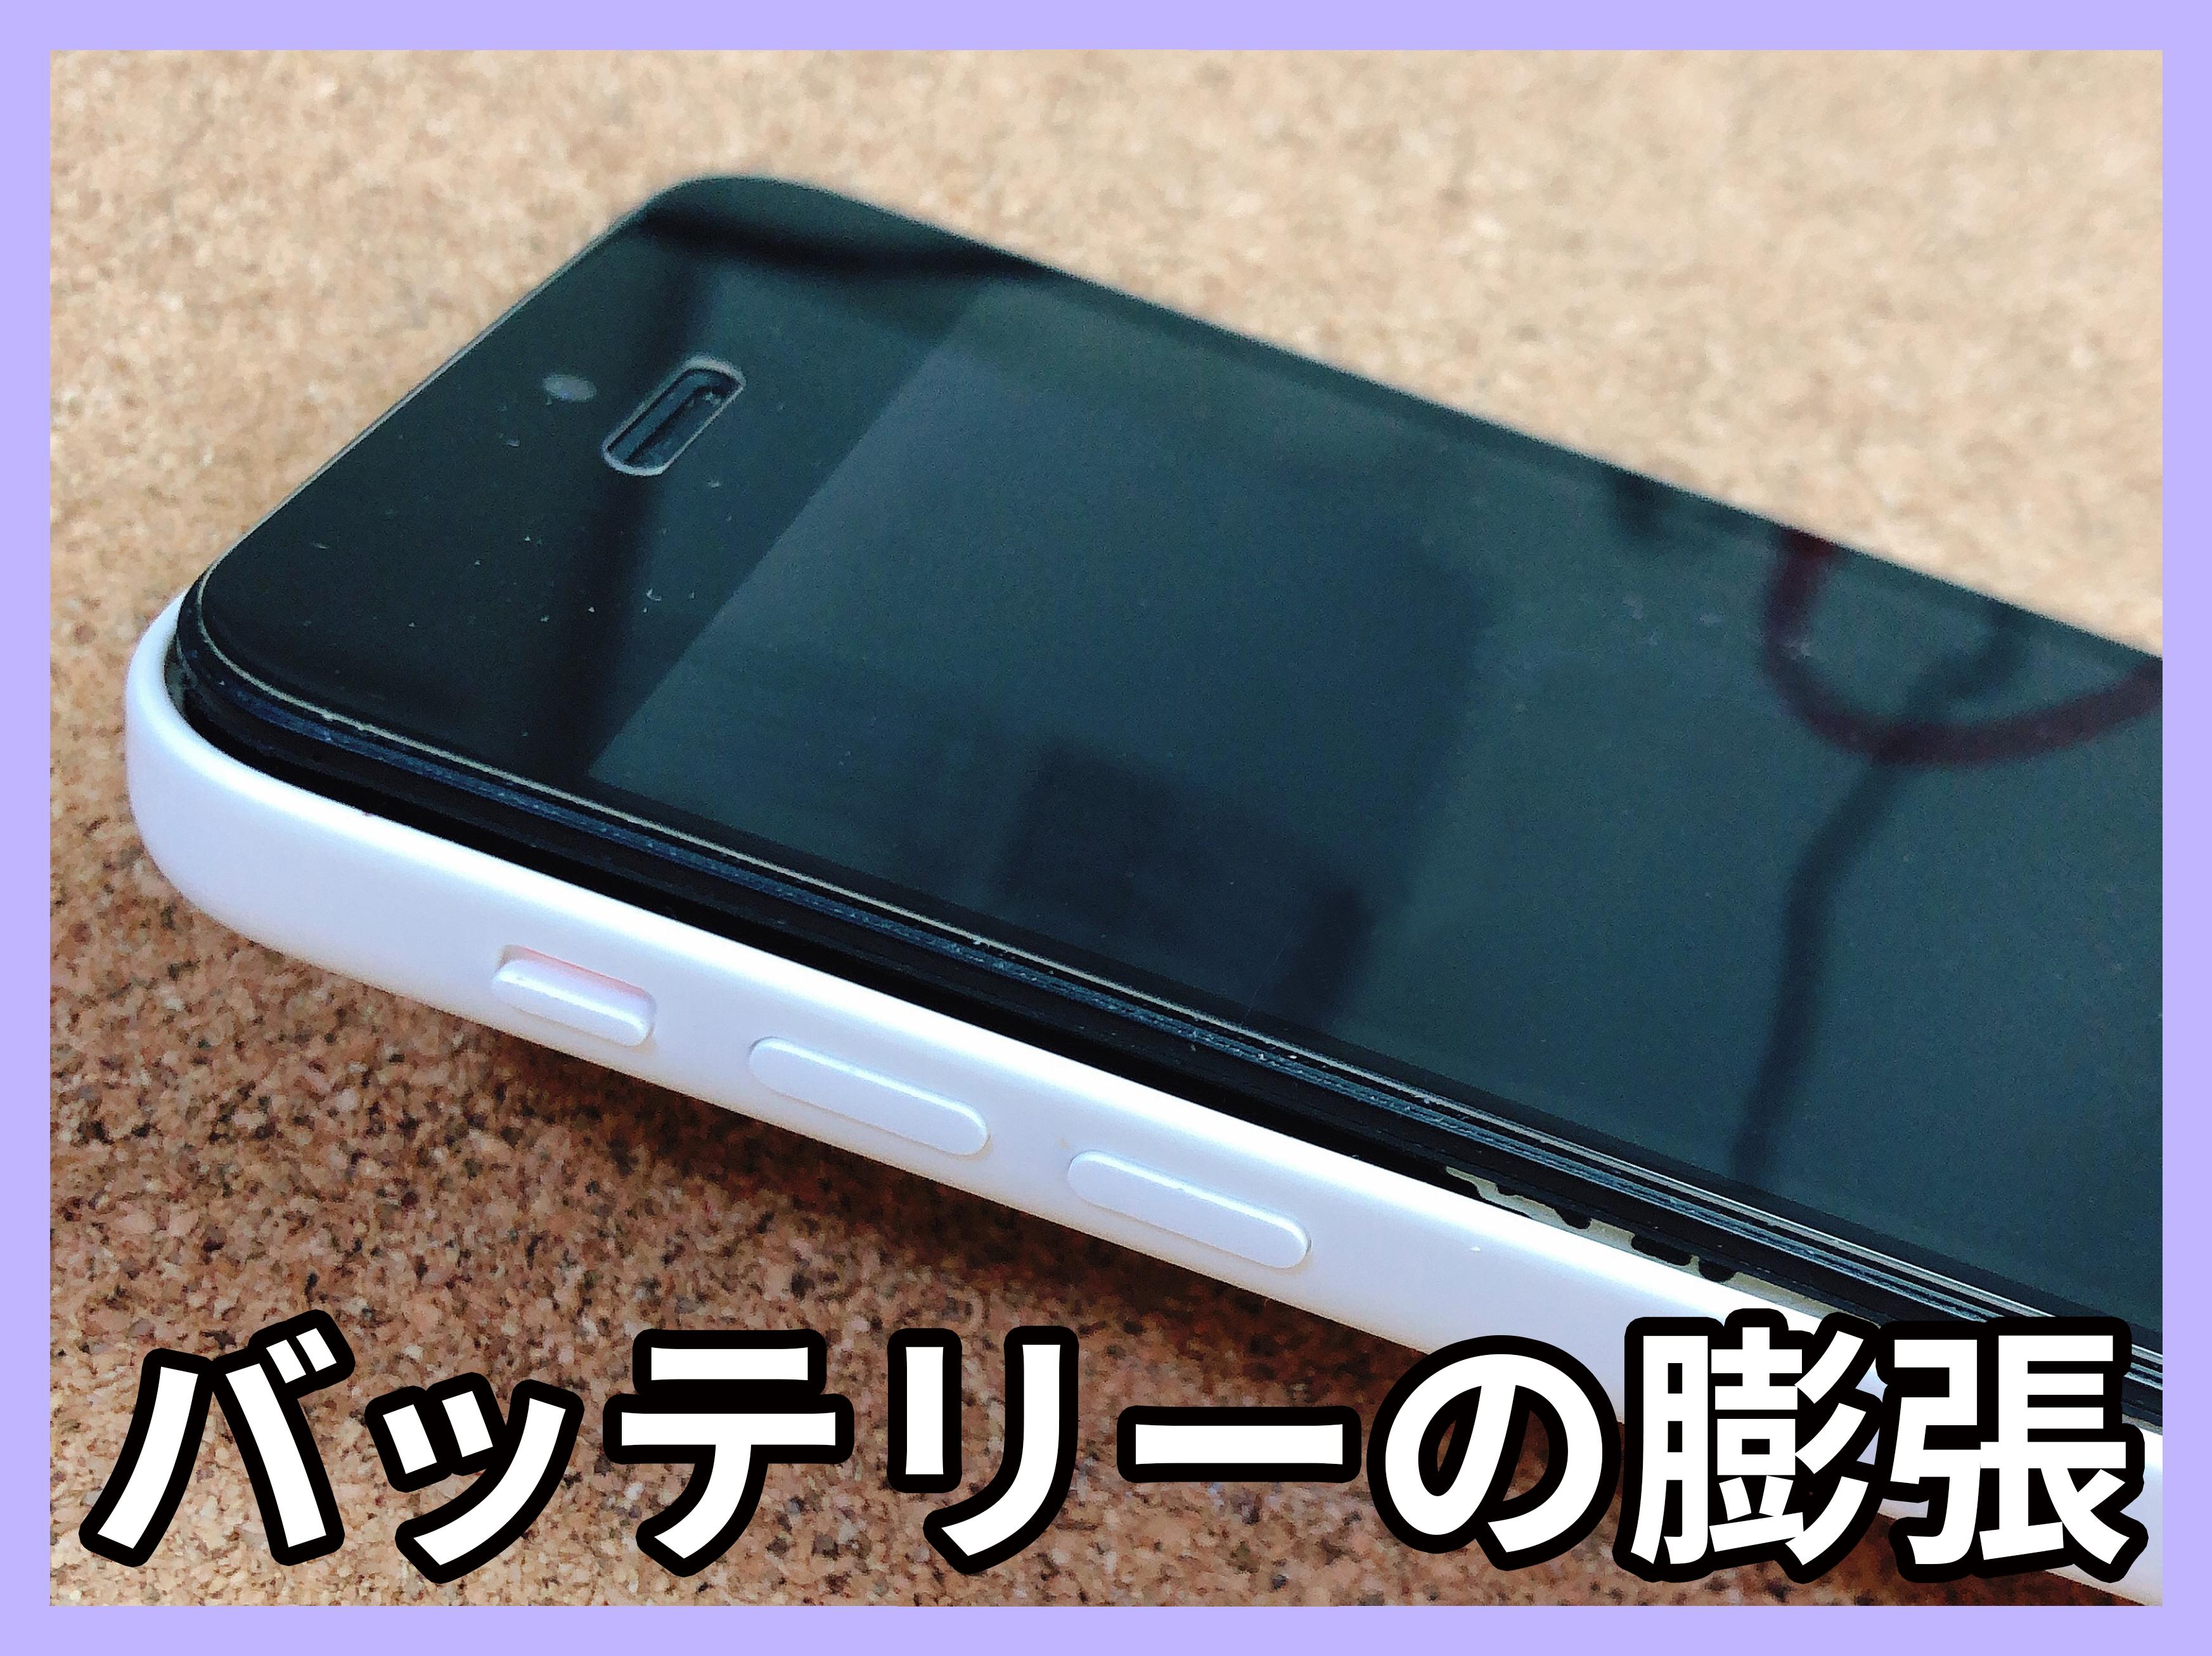 【iPhone5c バッテリー膨張 山梨県 笛吹市】iphone5c 電池交換 バッテリー笛吹市よりお越しのお客様です